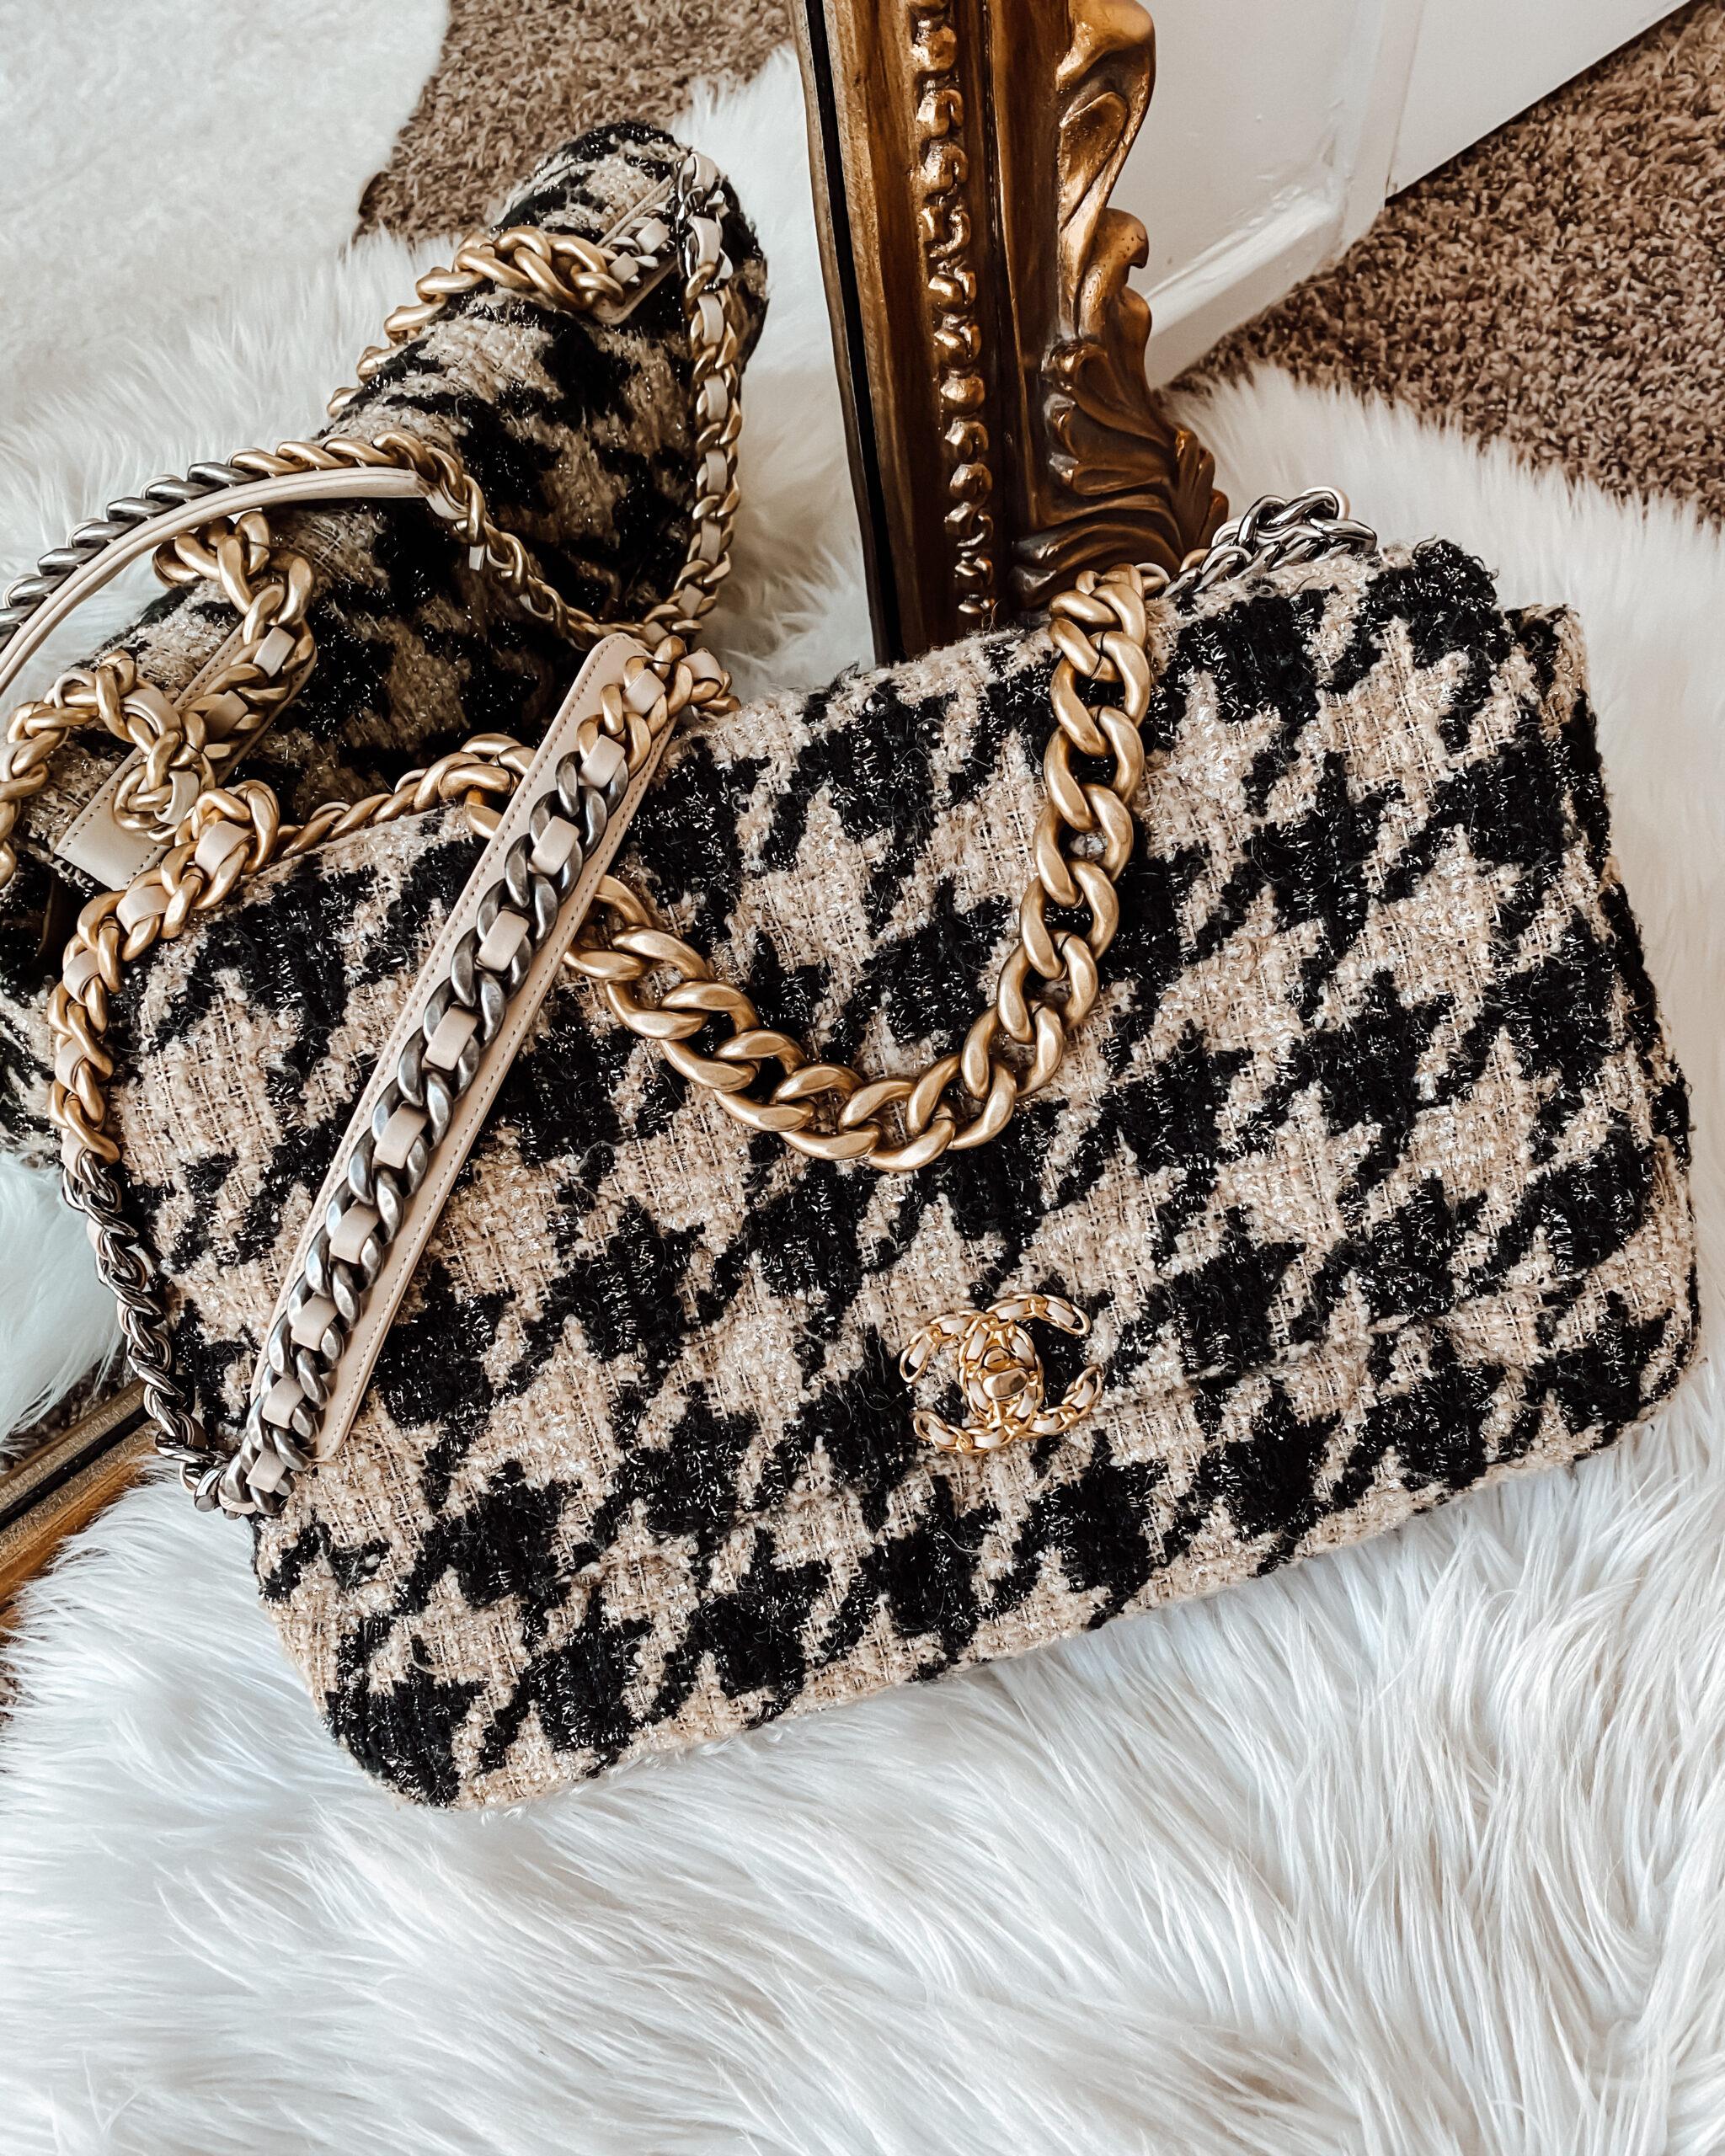 Fashion Jackson Chanel 19 Houndstooth Maxi